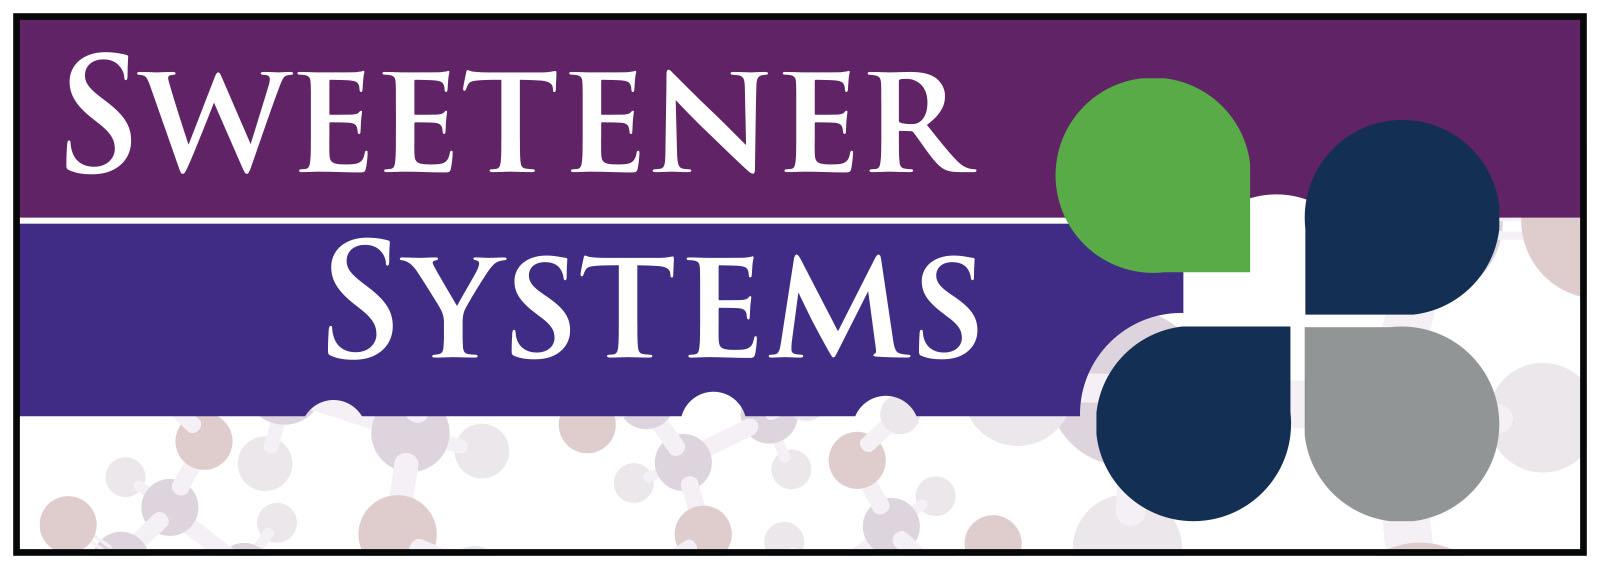 SWEETENER Systems Generic Logo